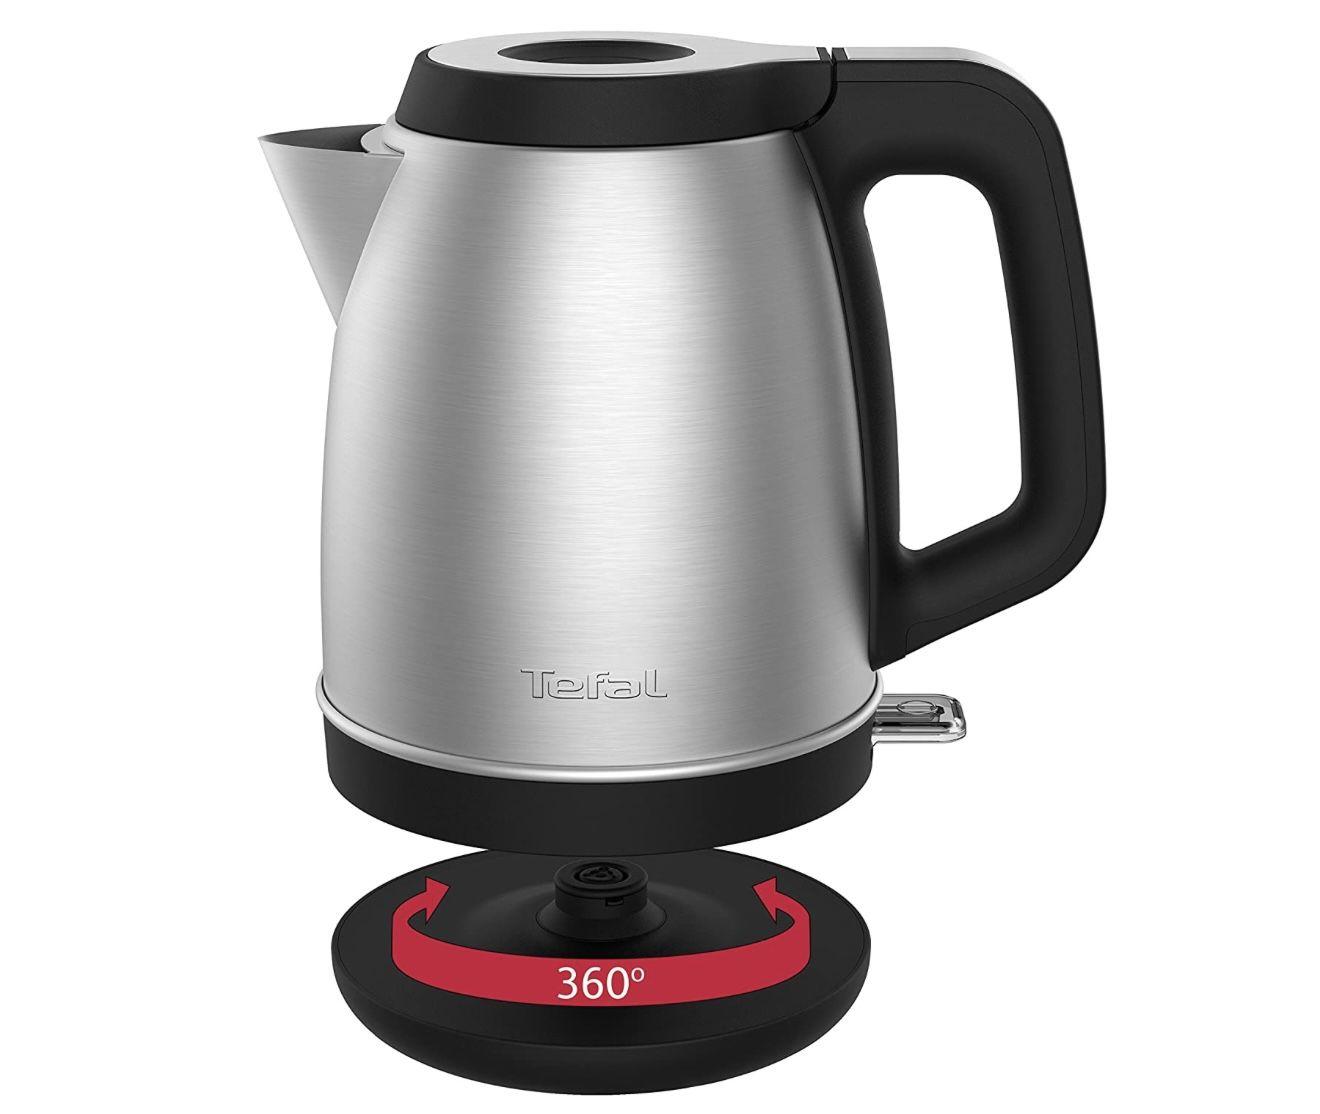 Tefal Element KI280D Premium Wasserkocher aus Edelstahl für 25,20€ (statt 30€) – Prime